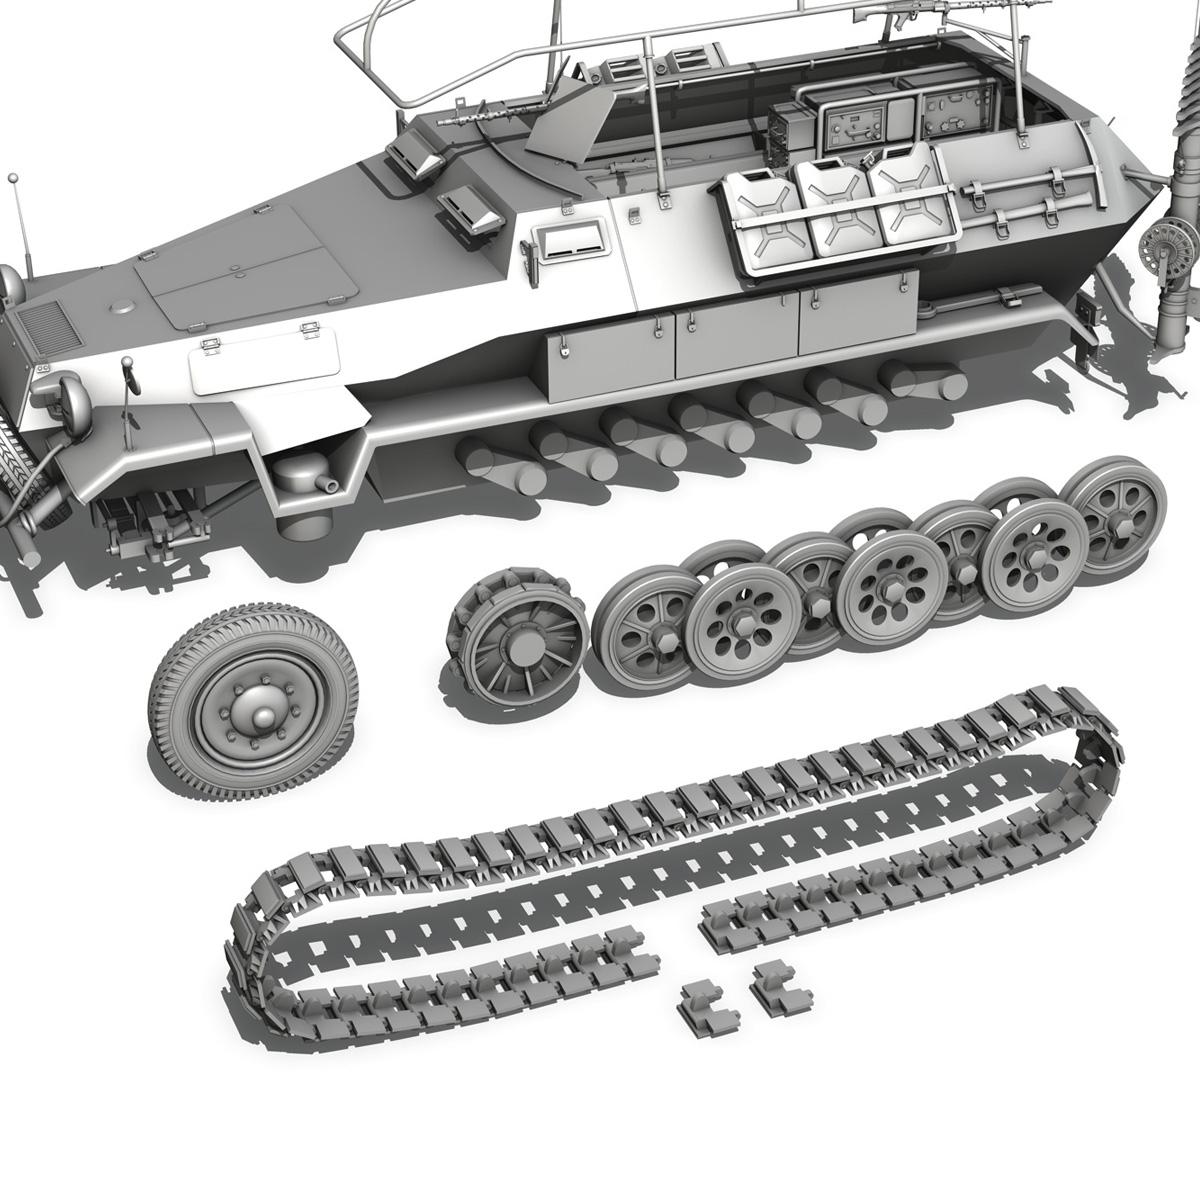 sdkfz 251 ausf.b – communications vehicle 3d model 3ds fbx c4d lwo obj 251699